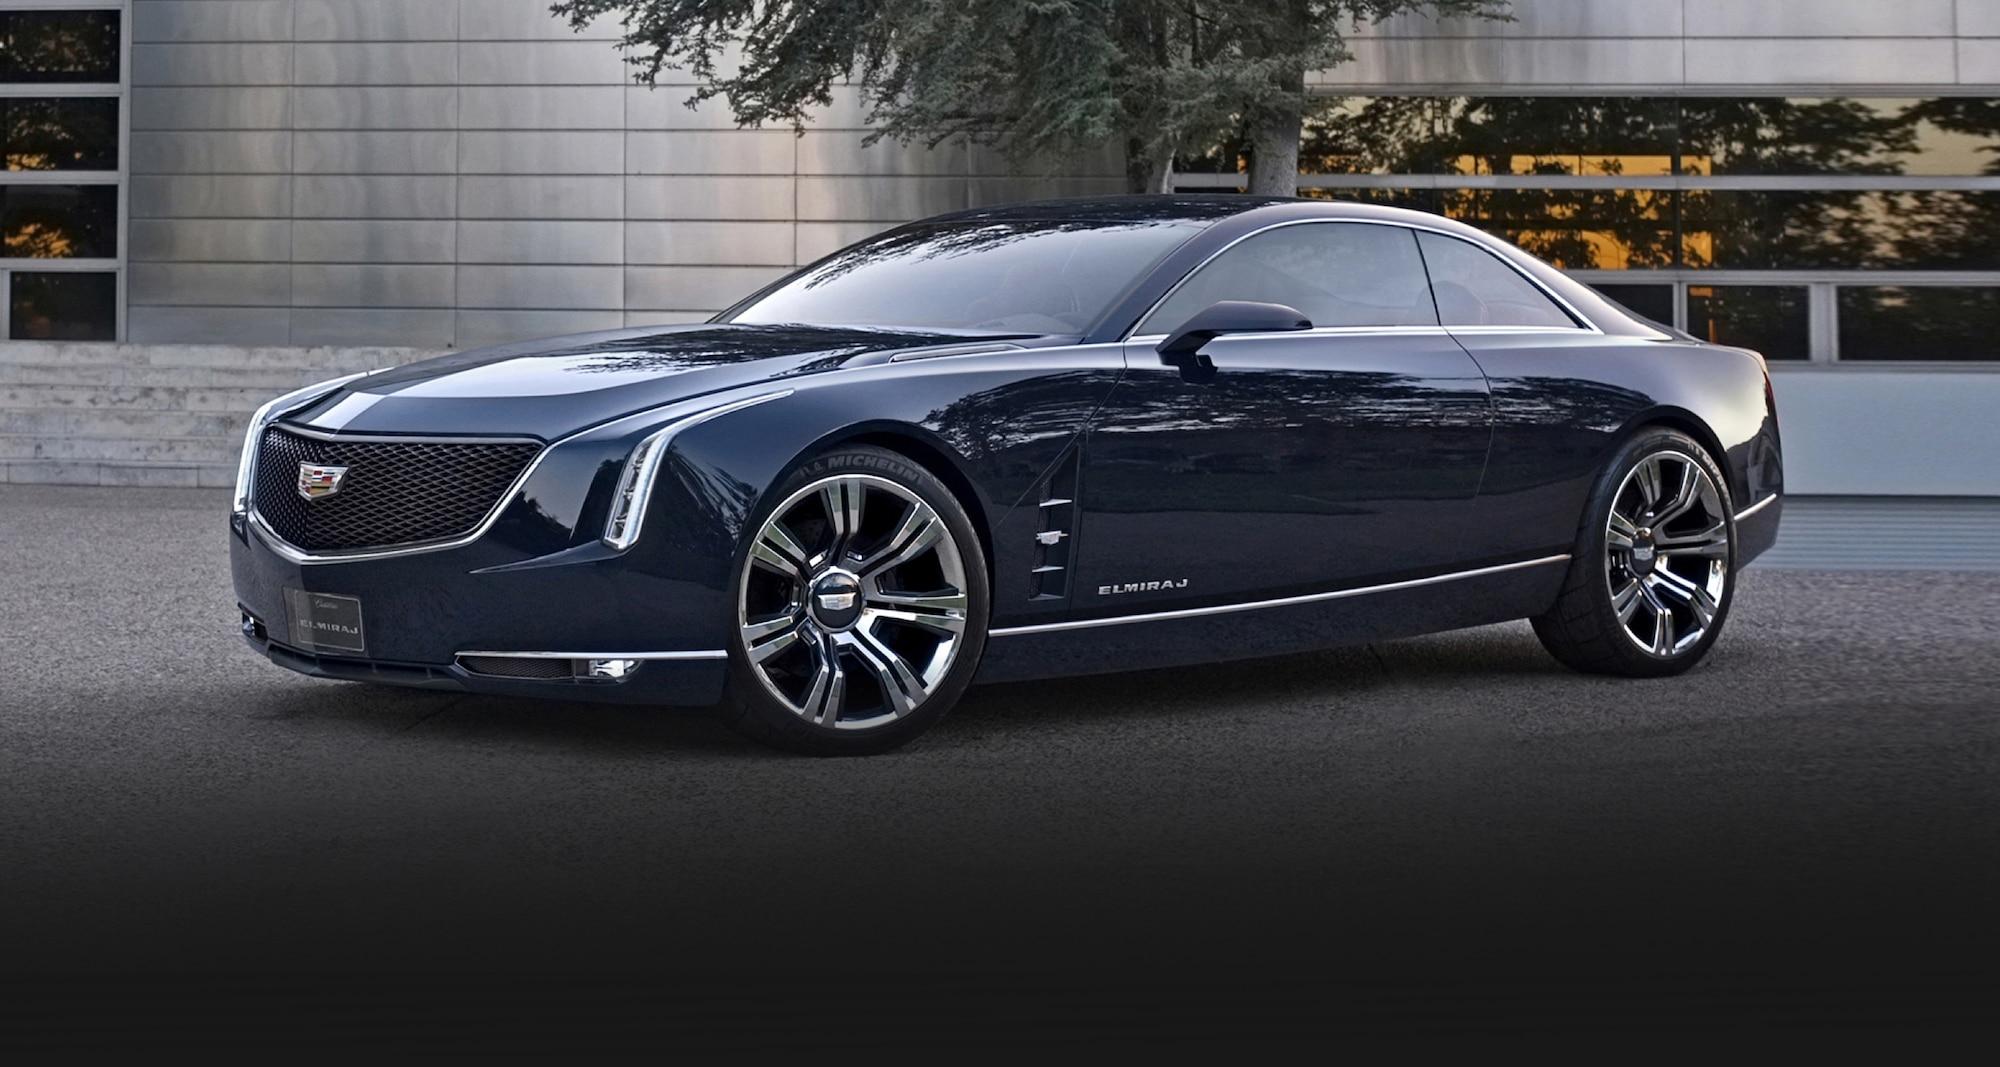 Cadillac coupe concept